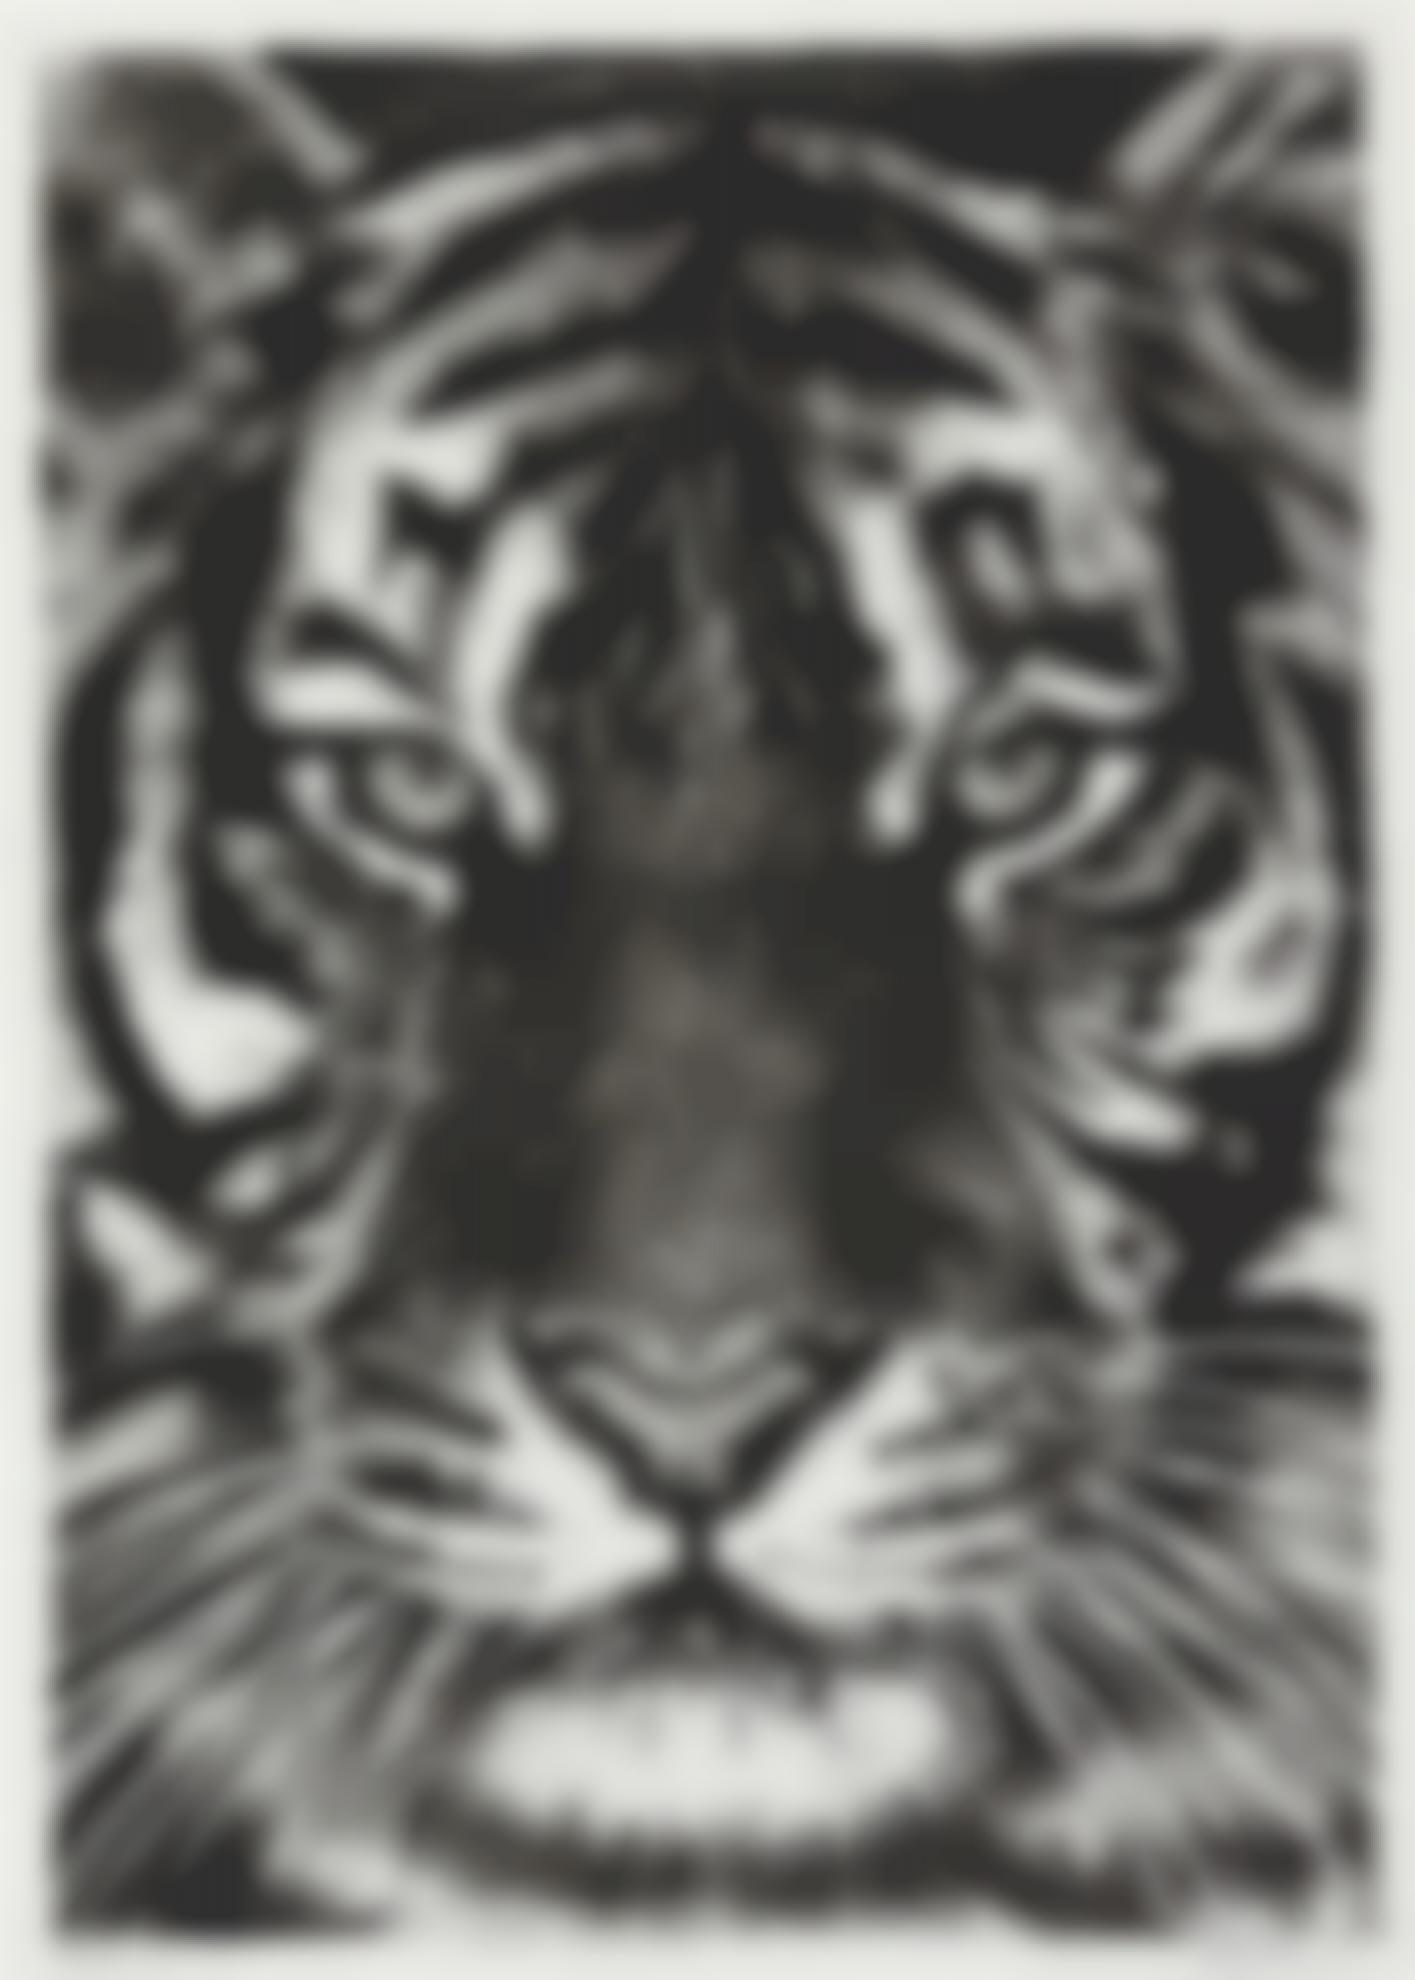 Robert Longo-Tiger Head 5B-2010